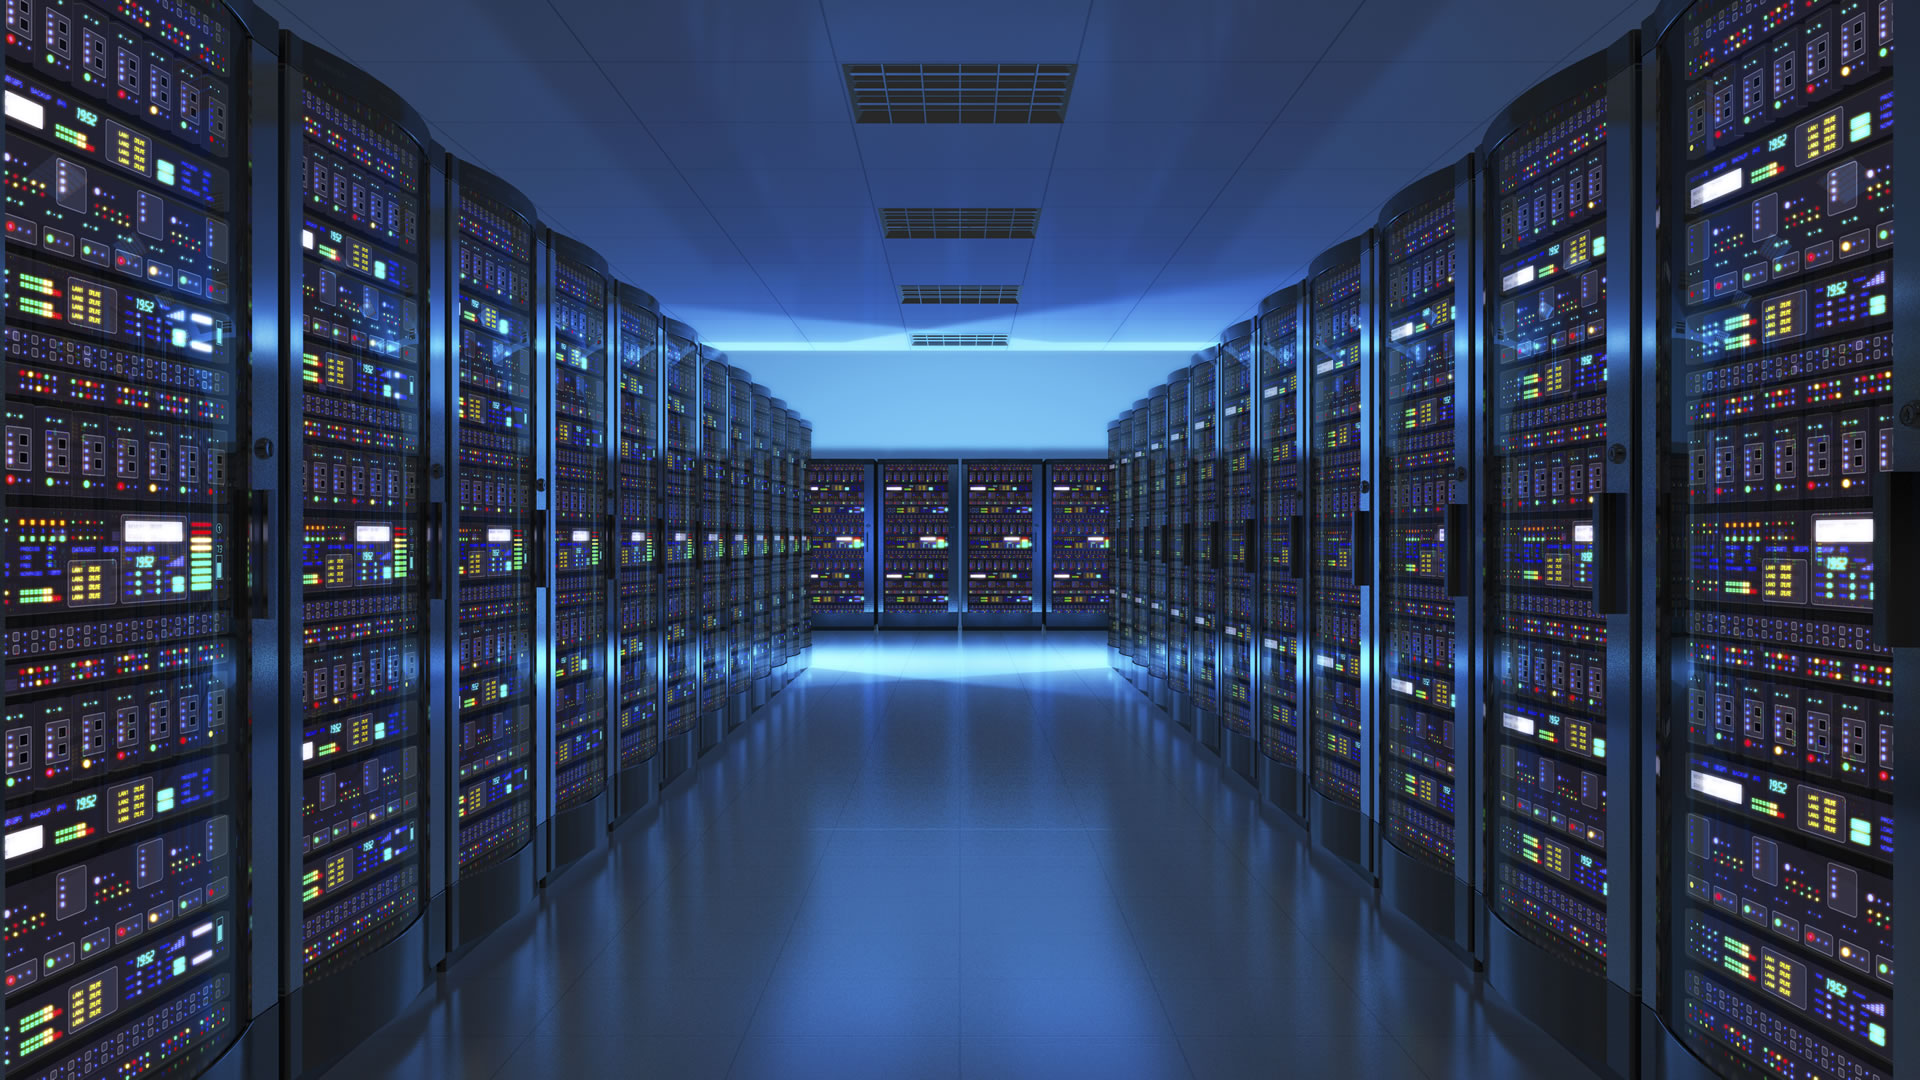 Kelebihan dan Kekurangan Dedicated Server Hosting